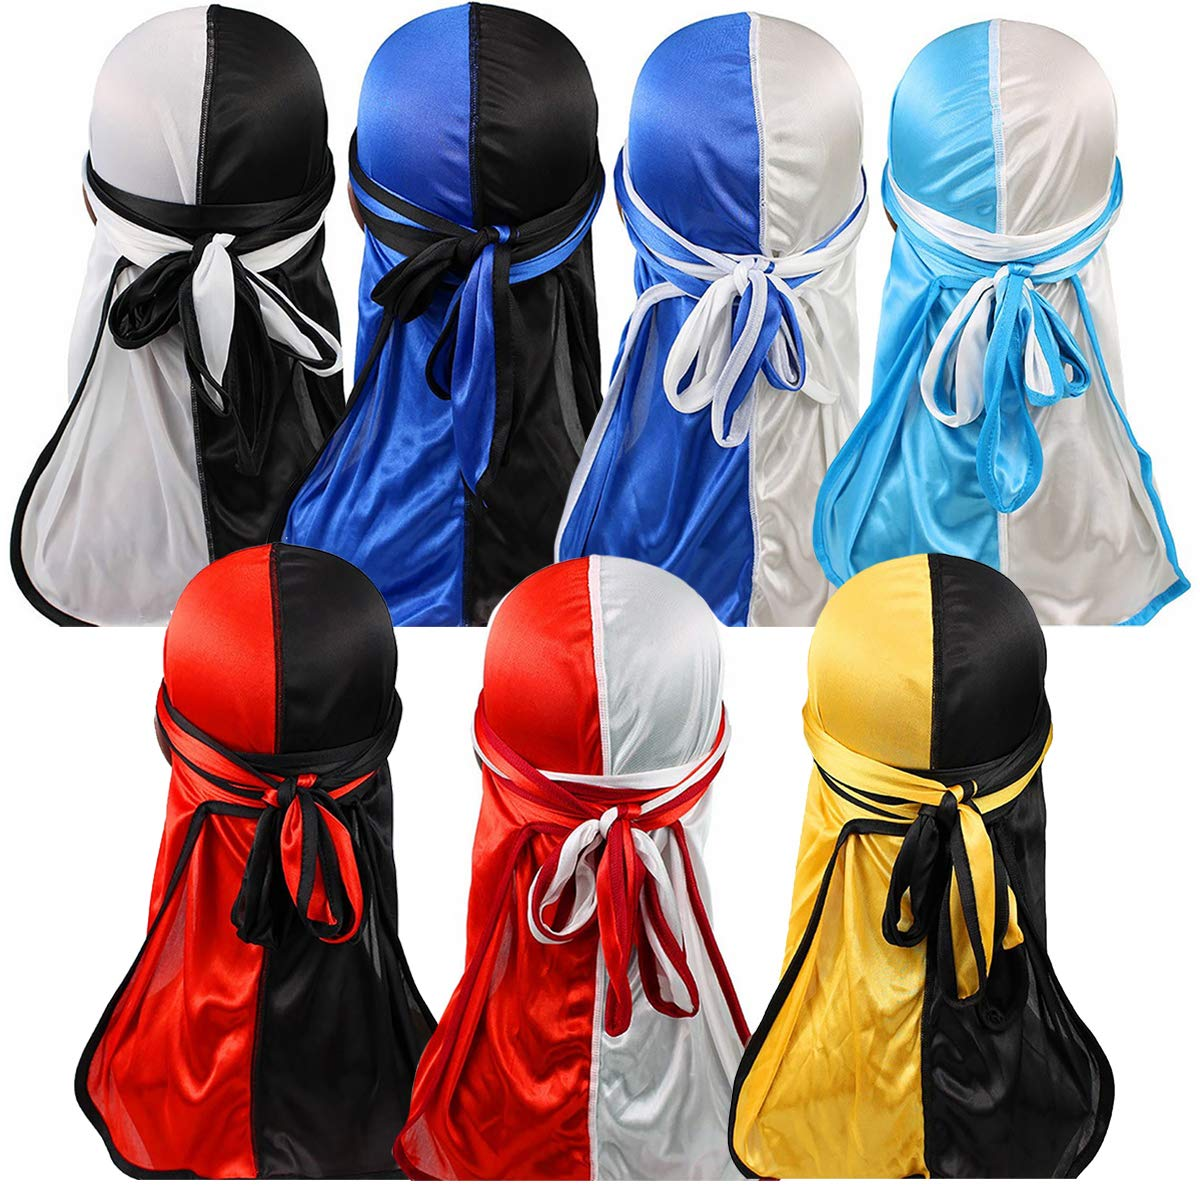 YI HENG MEI 2PCS/3PCS 360,540,720 Waves Color Block Silky Long Tail Durag Bandana Turban,Group 11(7pcs)